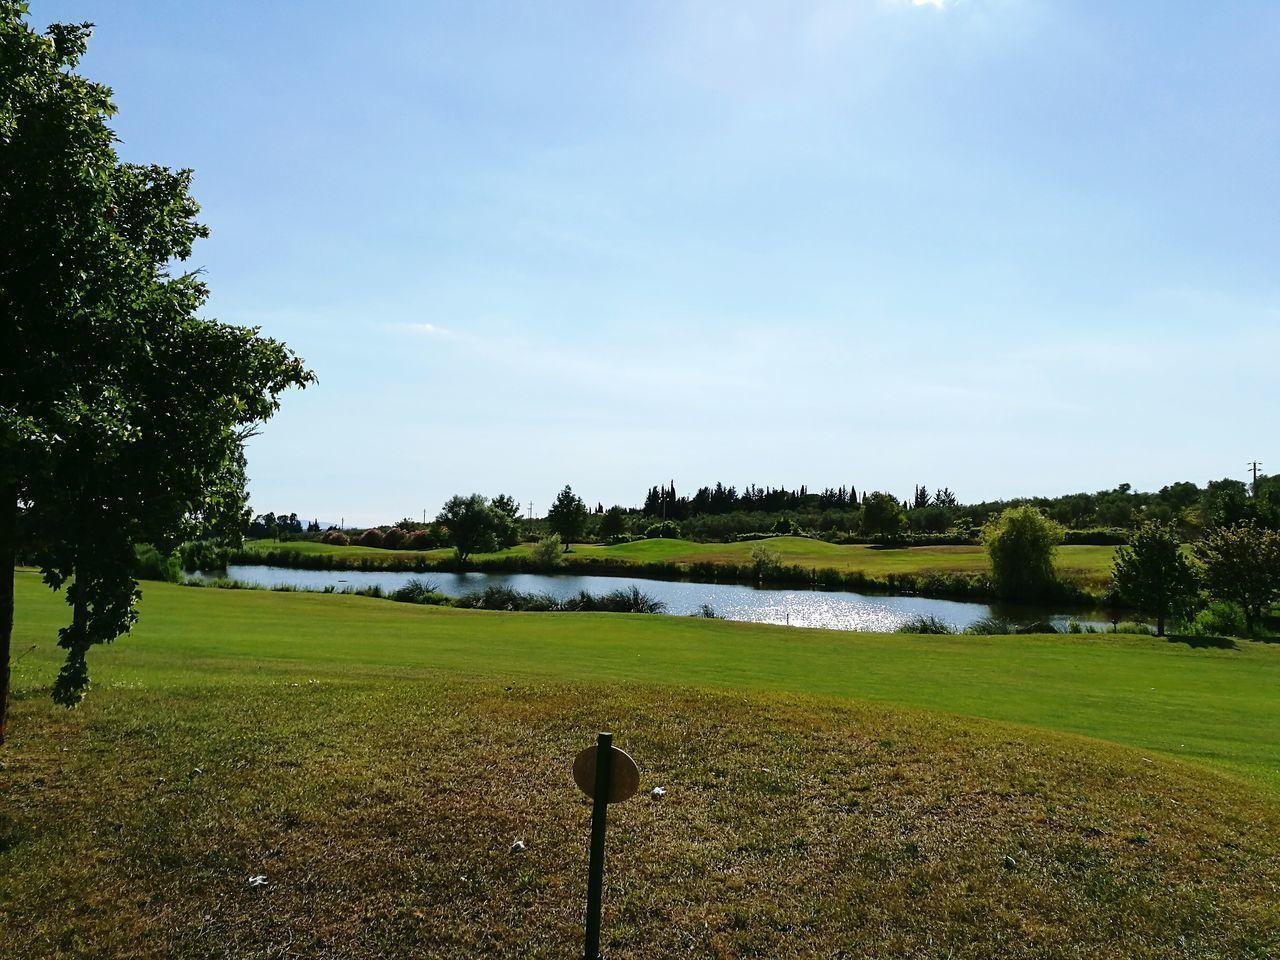 Golfresort Golf Pelagone Italy Maremma Toscana Enjoying Life Eyeem Photography Gavorrano, Toskana Gavorrano EyeEm